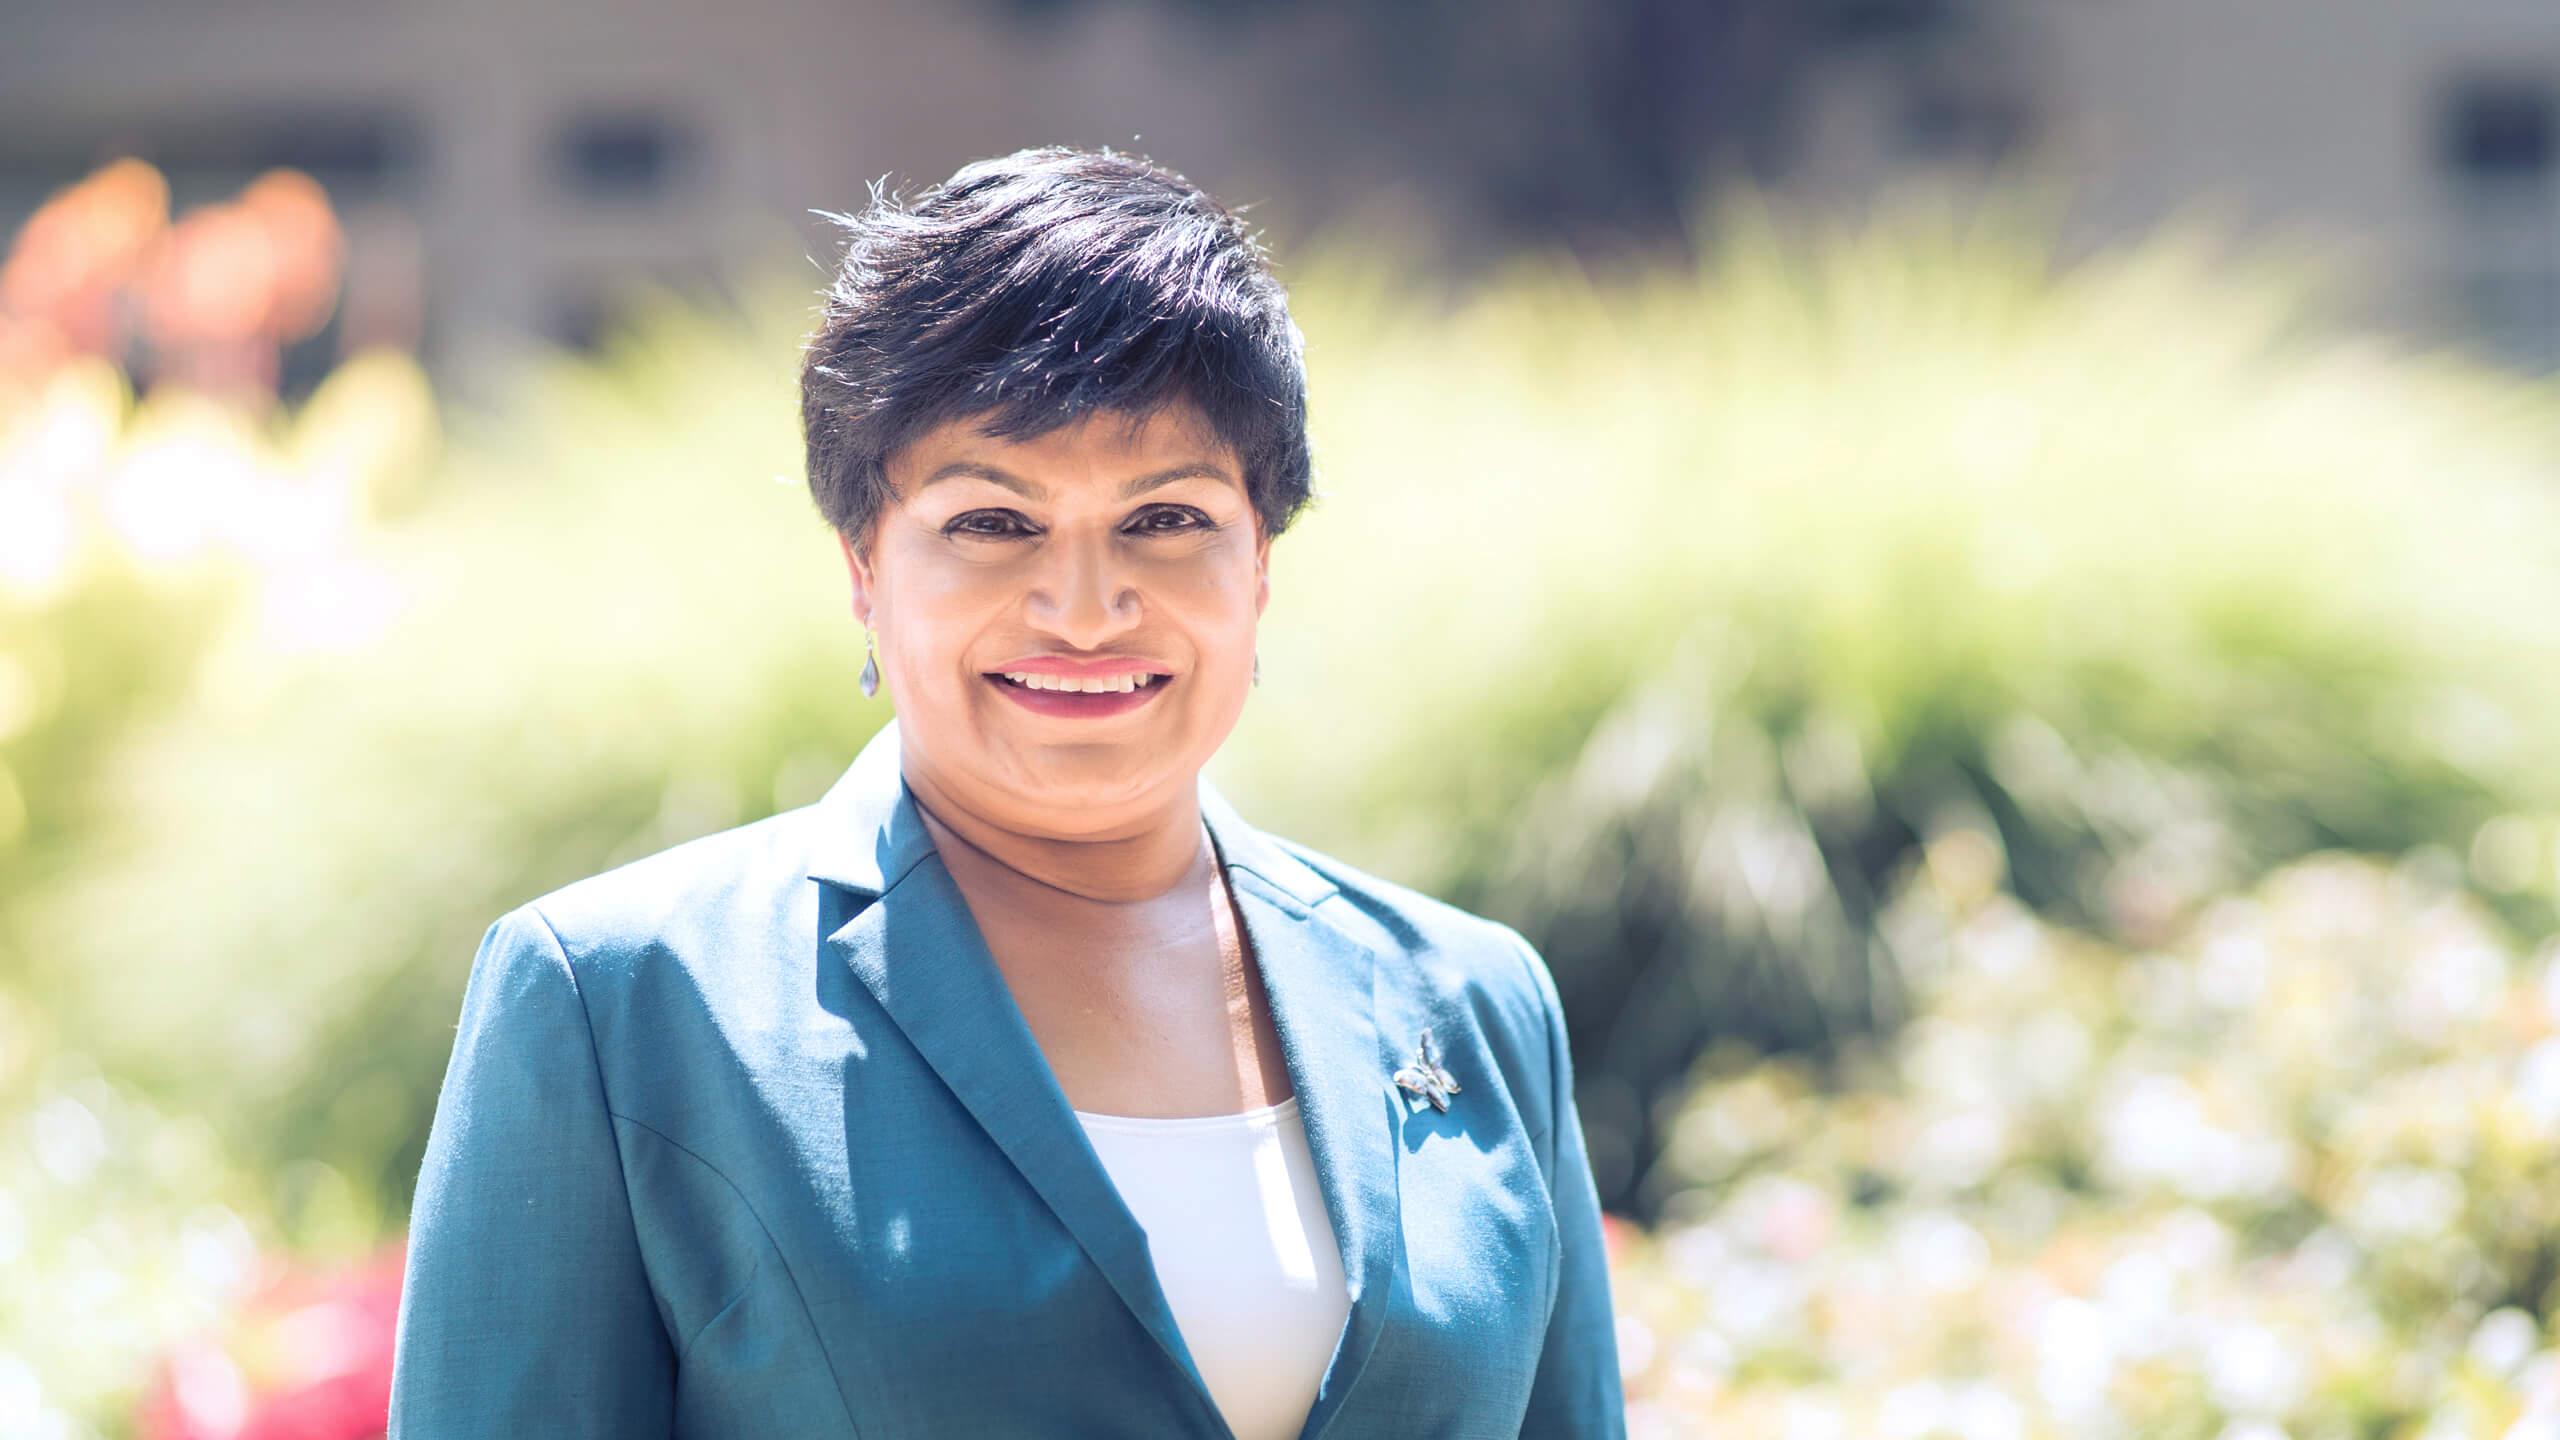 Rajshree Agarwal: The Importance of Empowerment